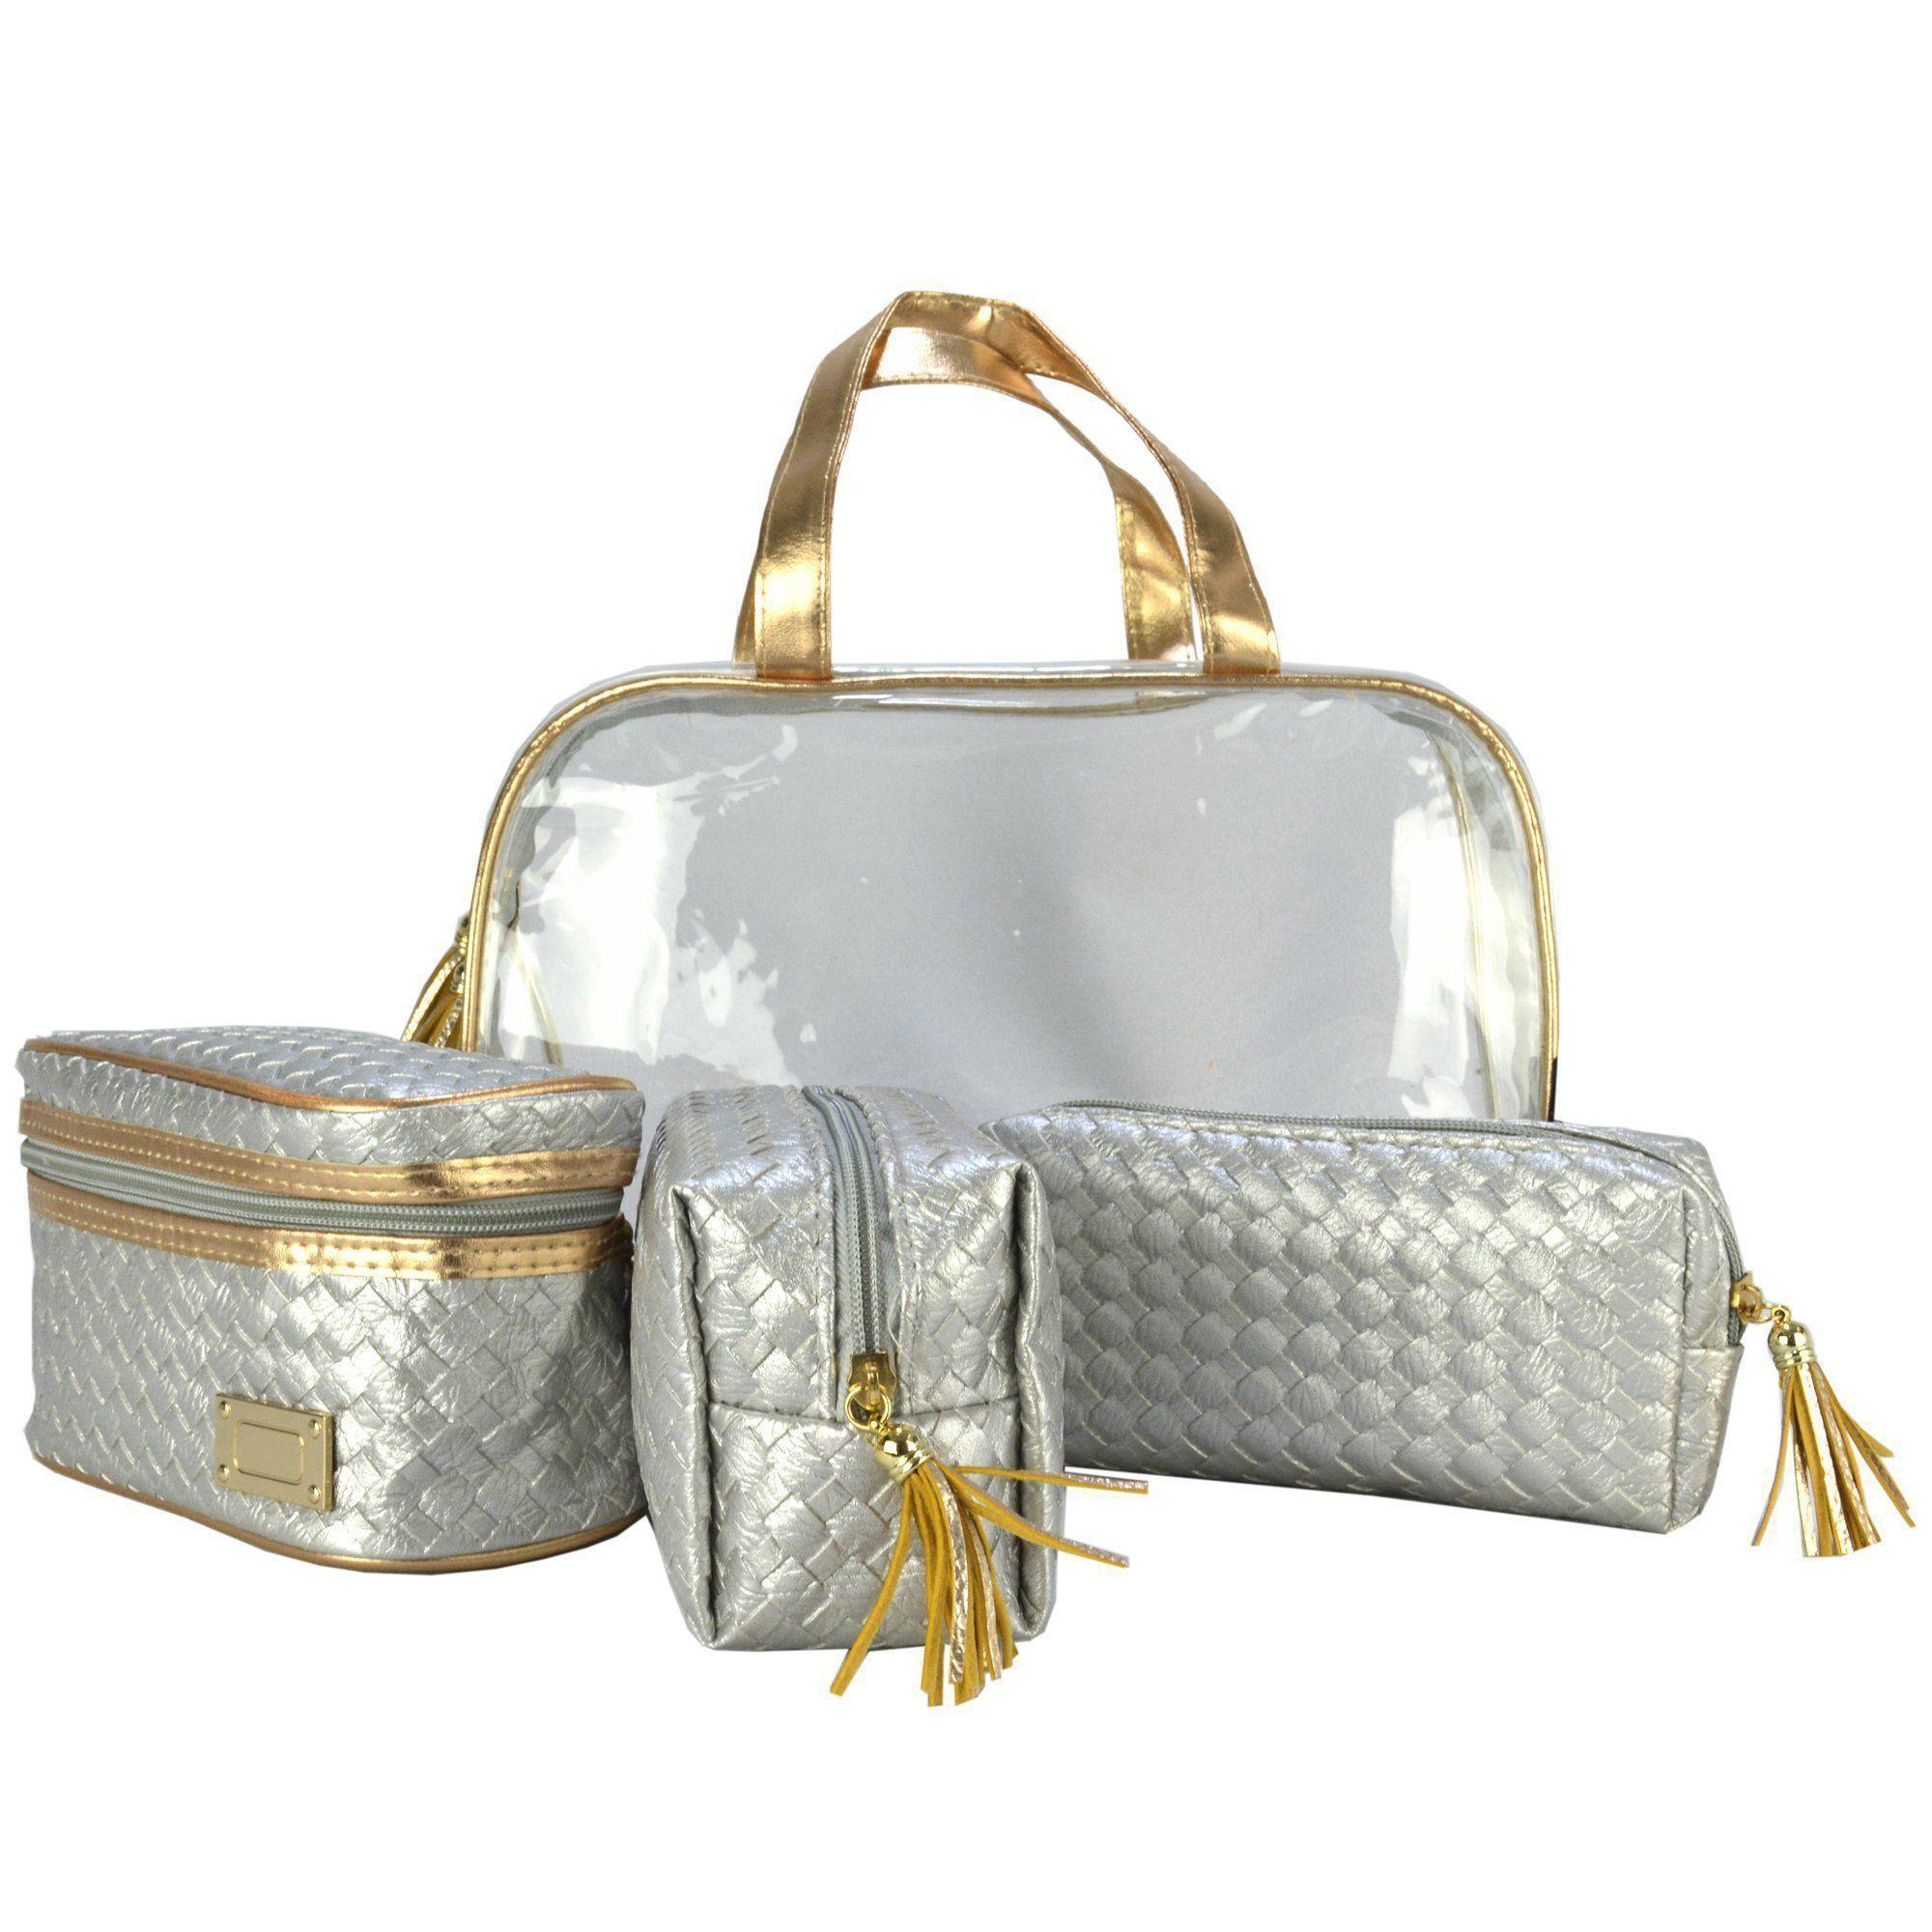 Frasqueiras Necessaire Feminina Luxo Prata Kit 4 Peças CBRN08223